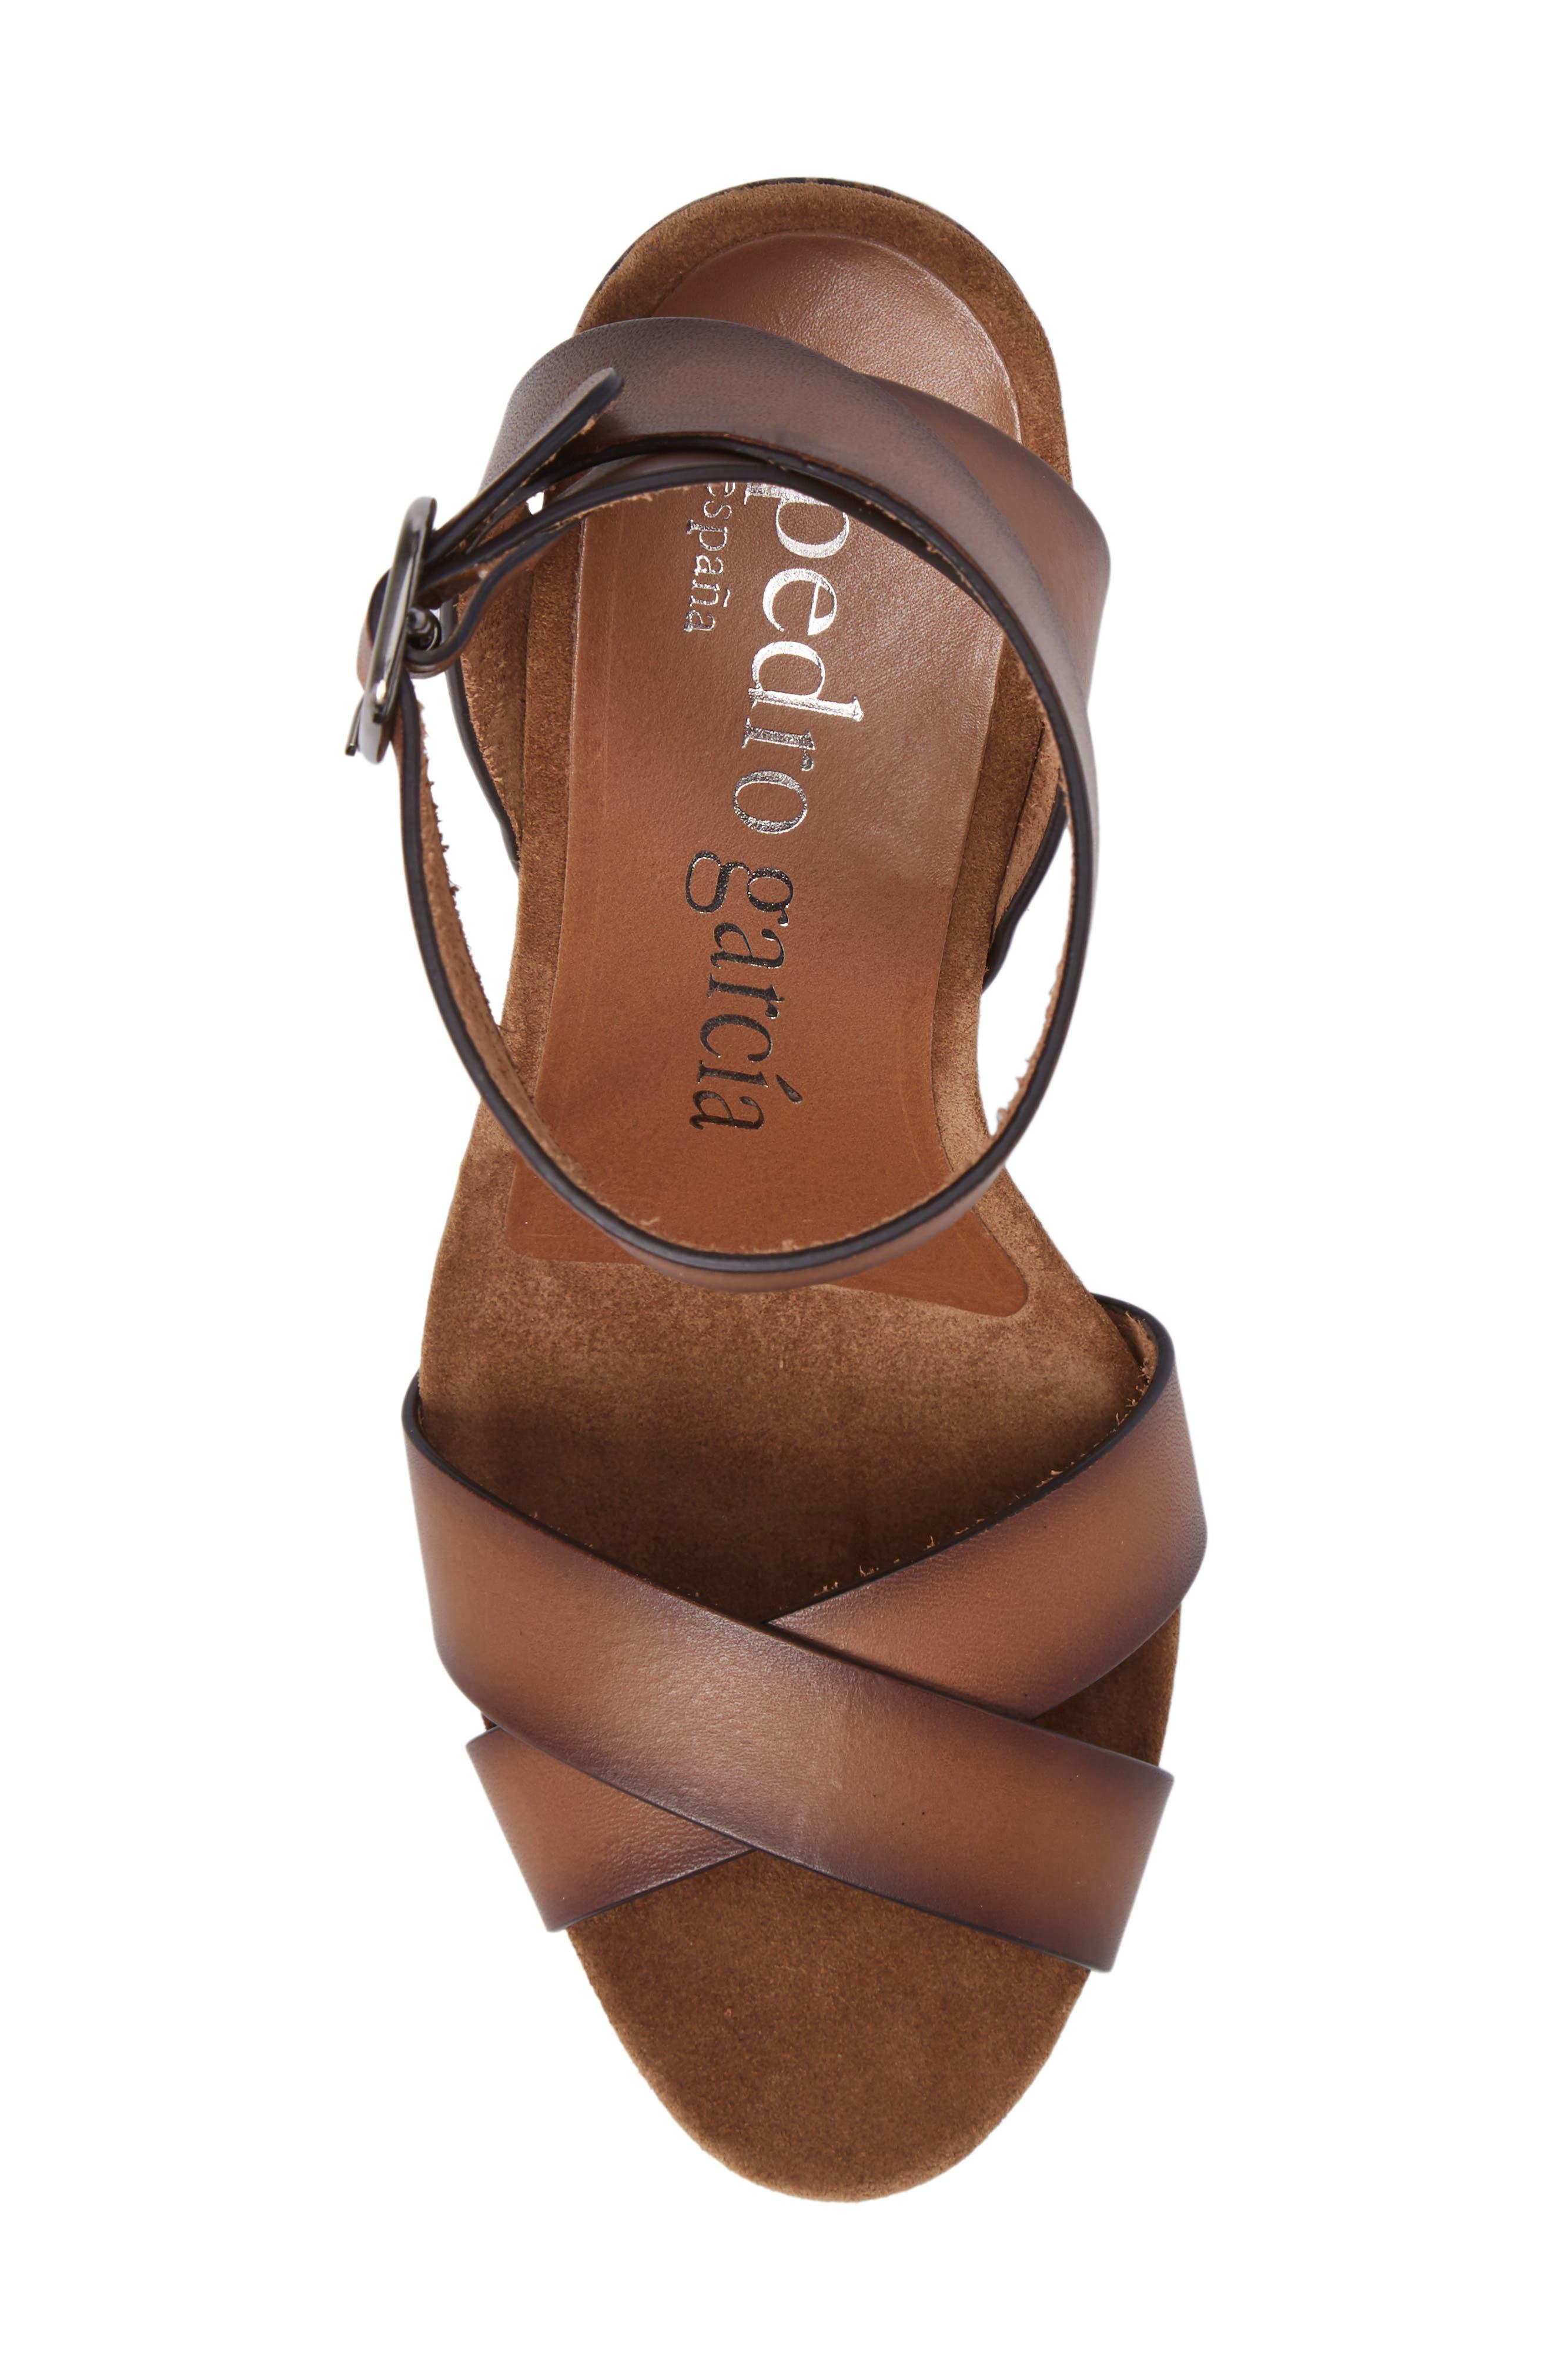 Yemba Embellished Heel Sandal,                             Alternate thumbnail 5, color,                             Cigar Vacchetta